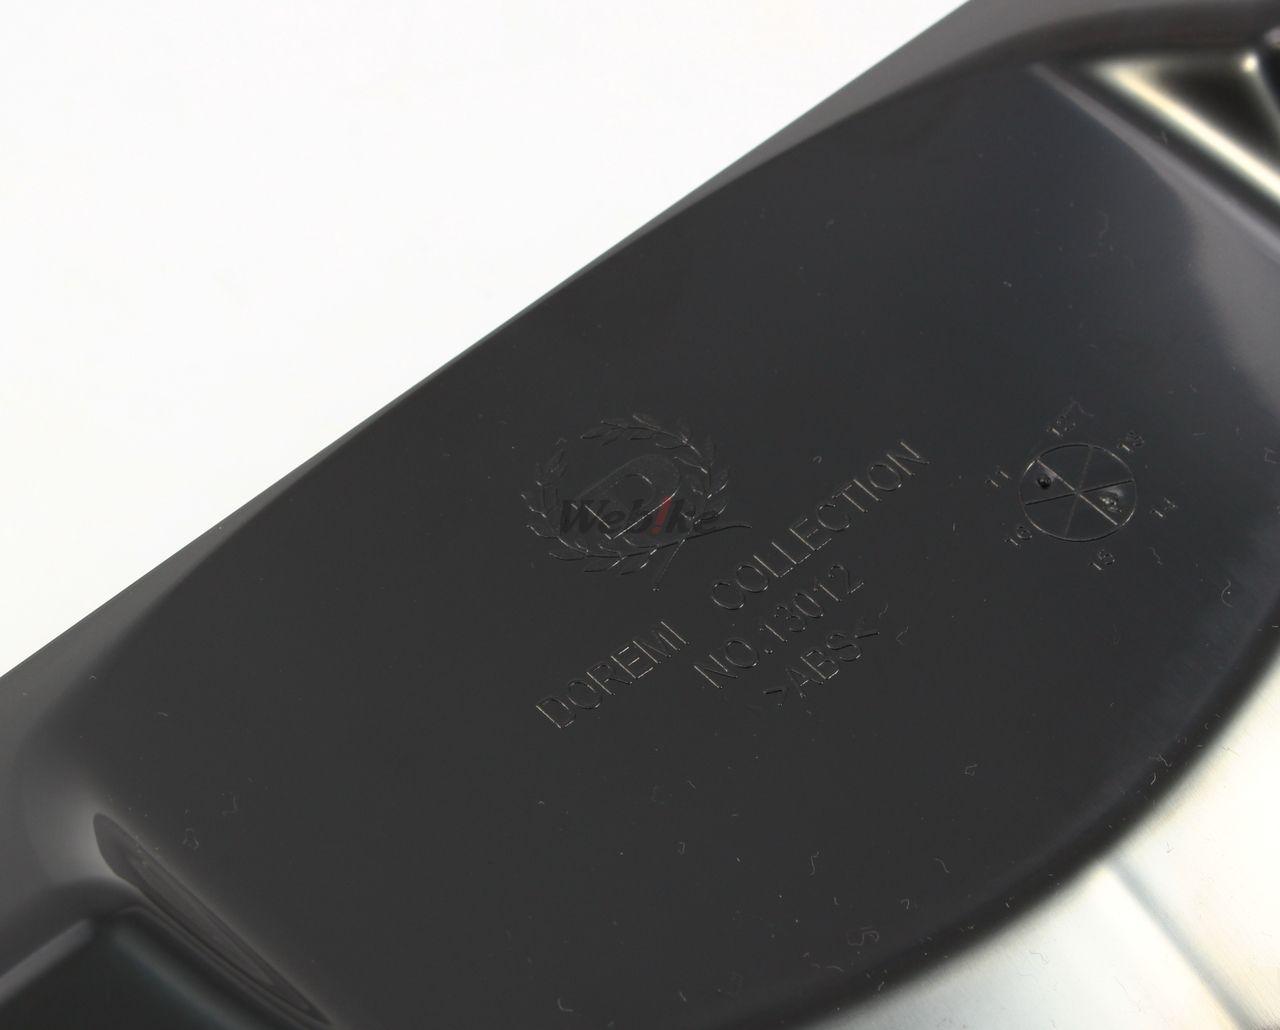 【DOREMI COLLECTION】尾殼內板 - 「Webike-摩托百貨」